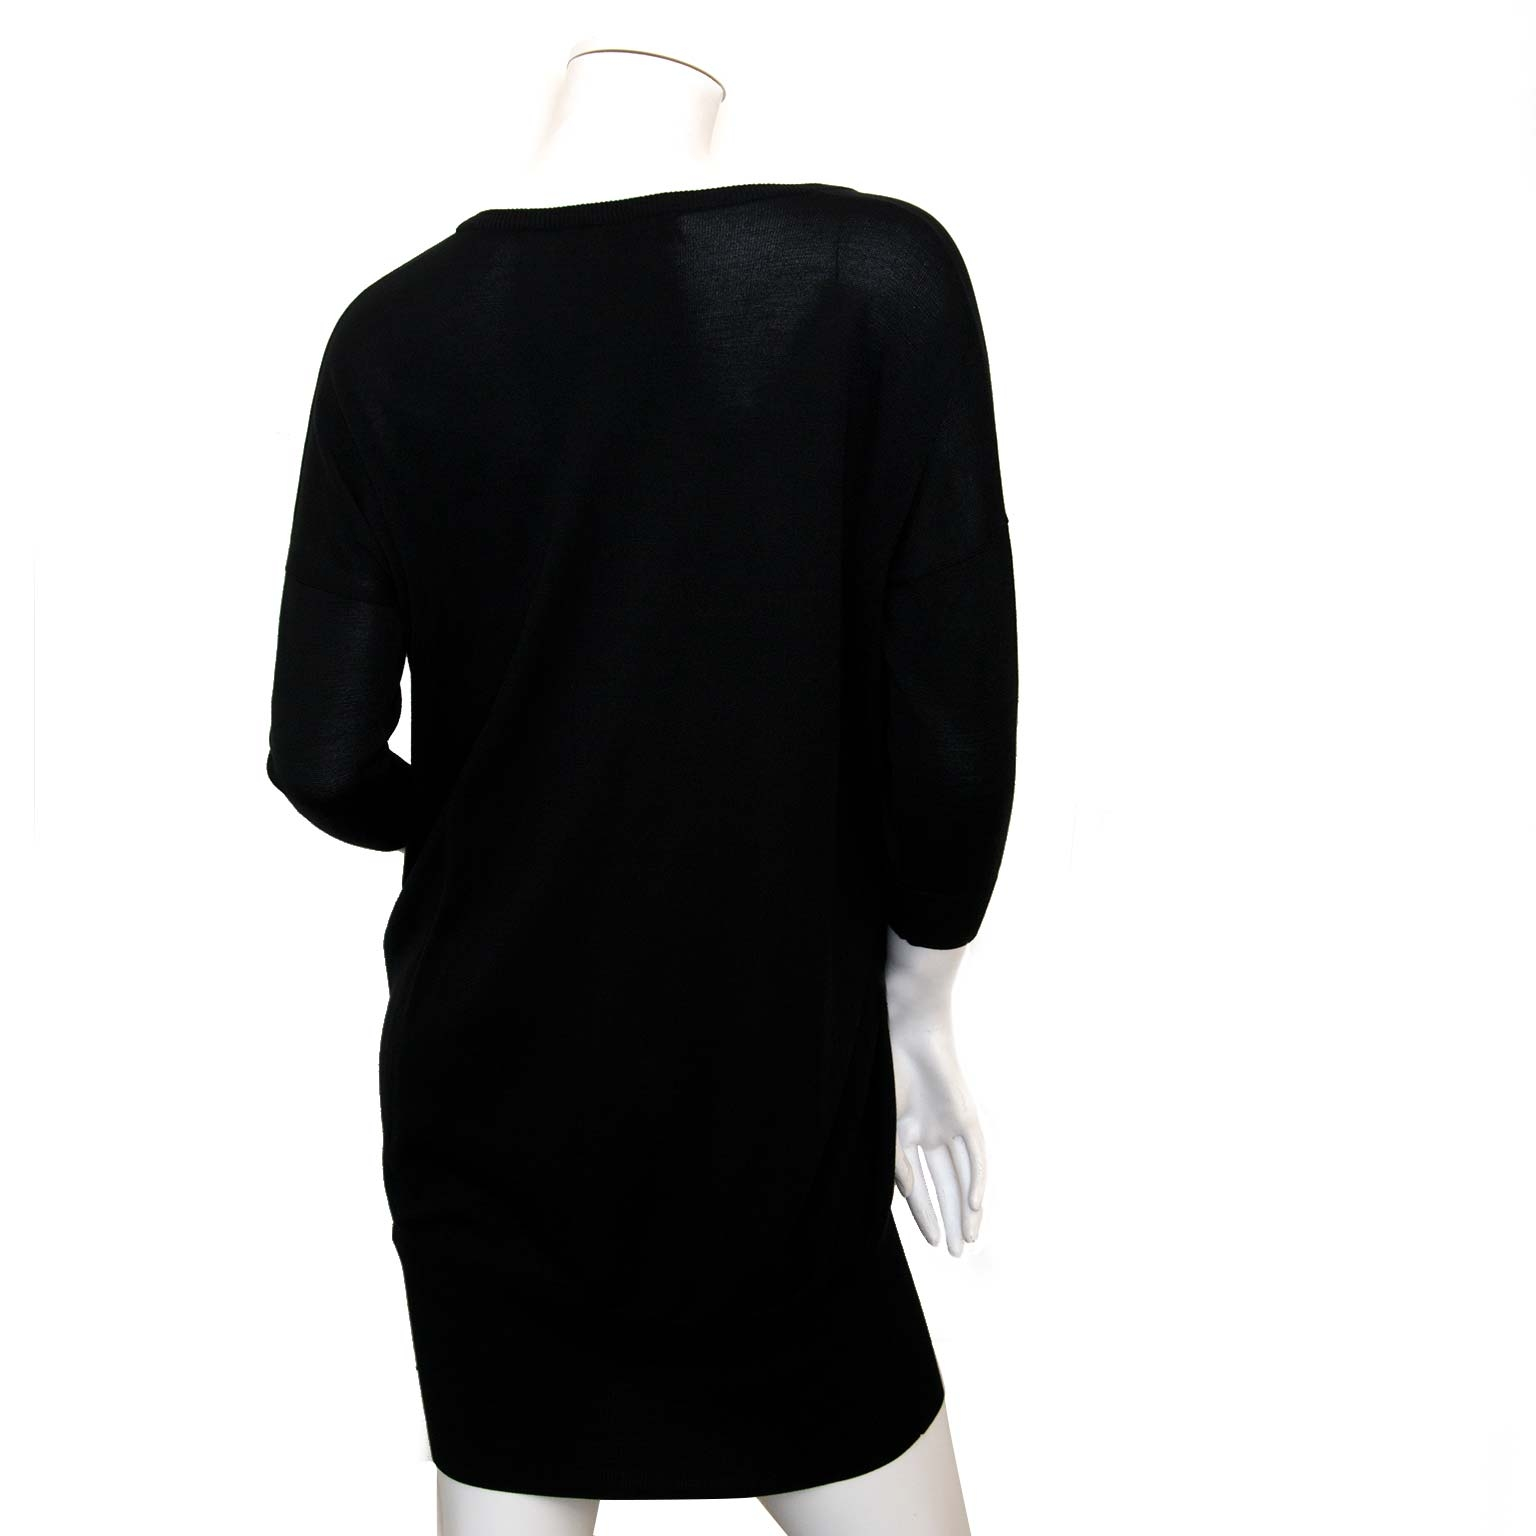 e0f8fc4d035b7 ... Buy authentic Balenciaga dresses online at Labellov vintage fashion  webshop